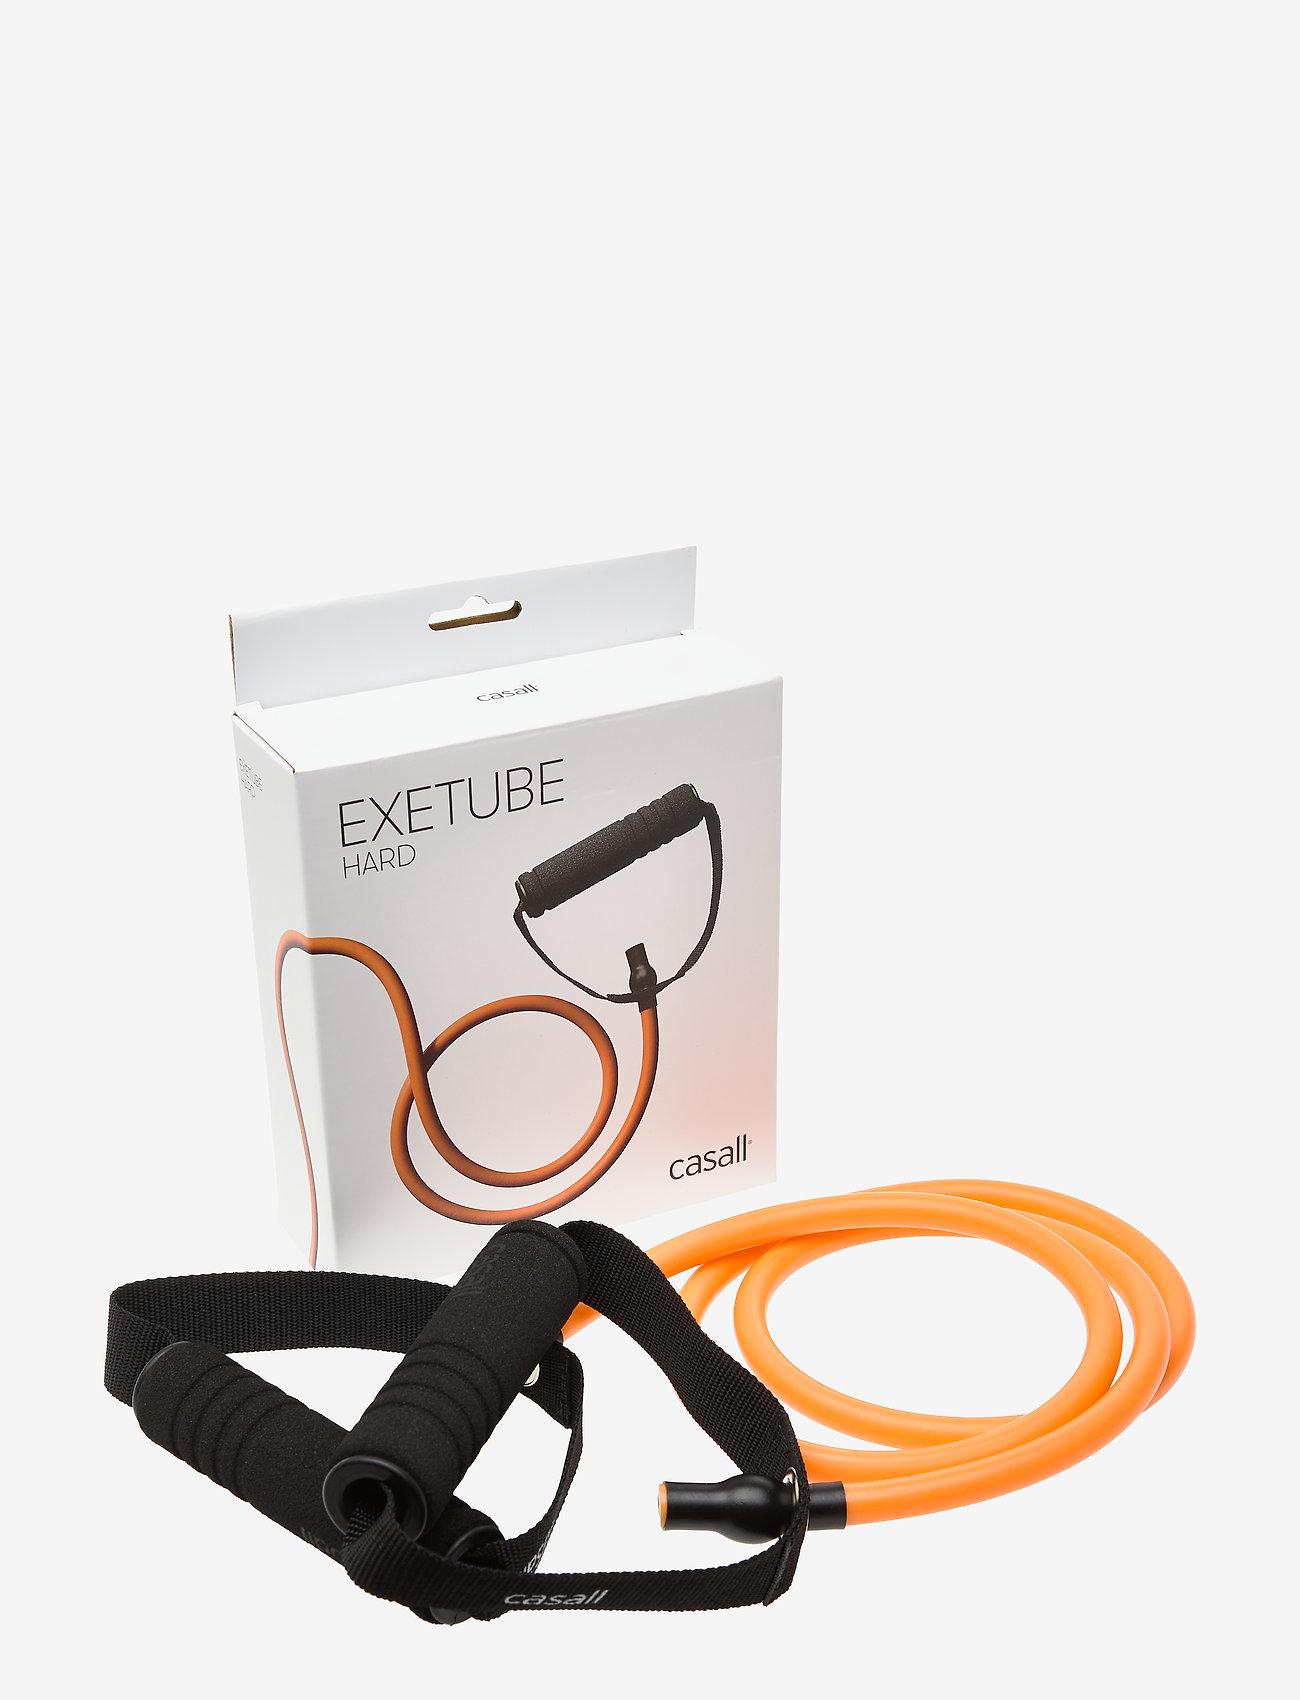 Casall - Exetube hard - trainingsmateriaal - orange - 0